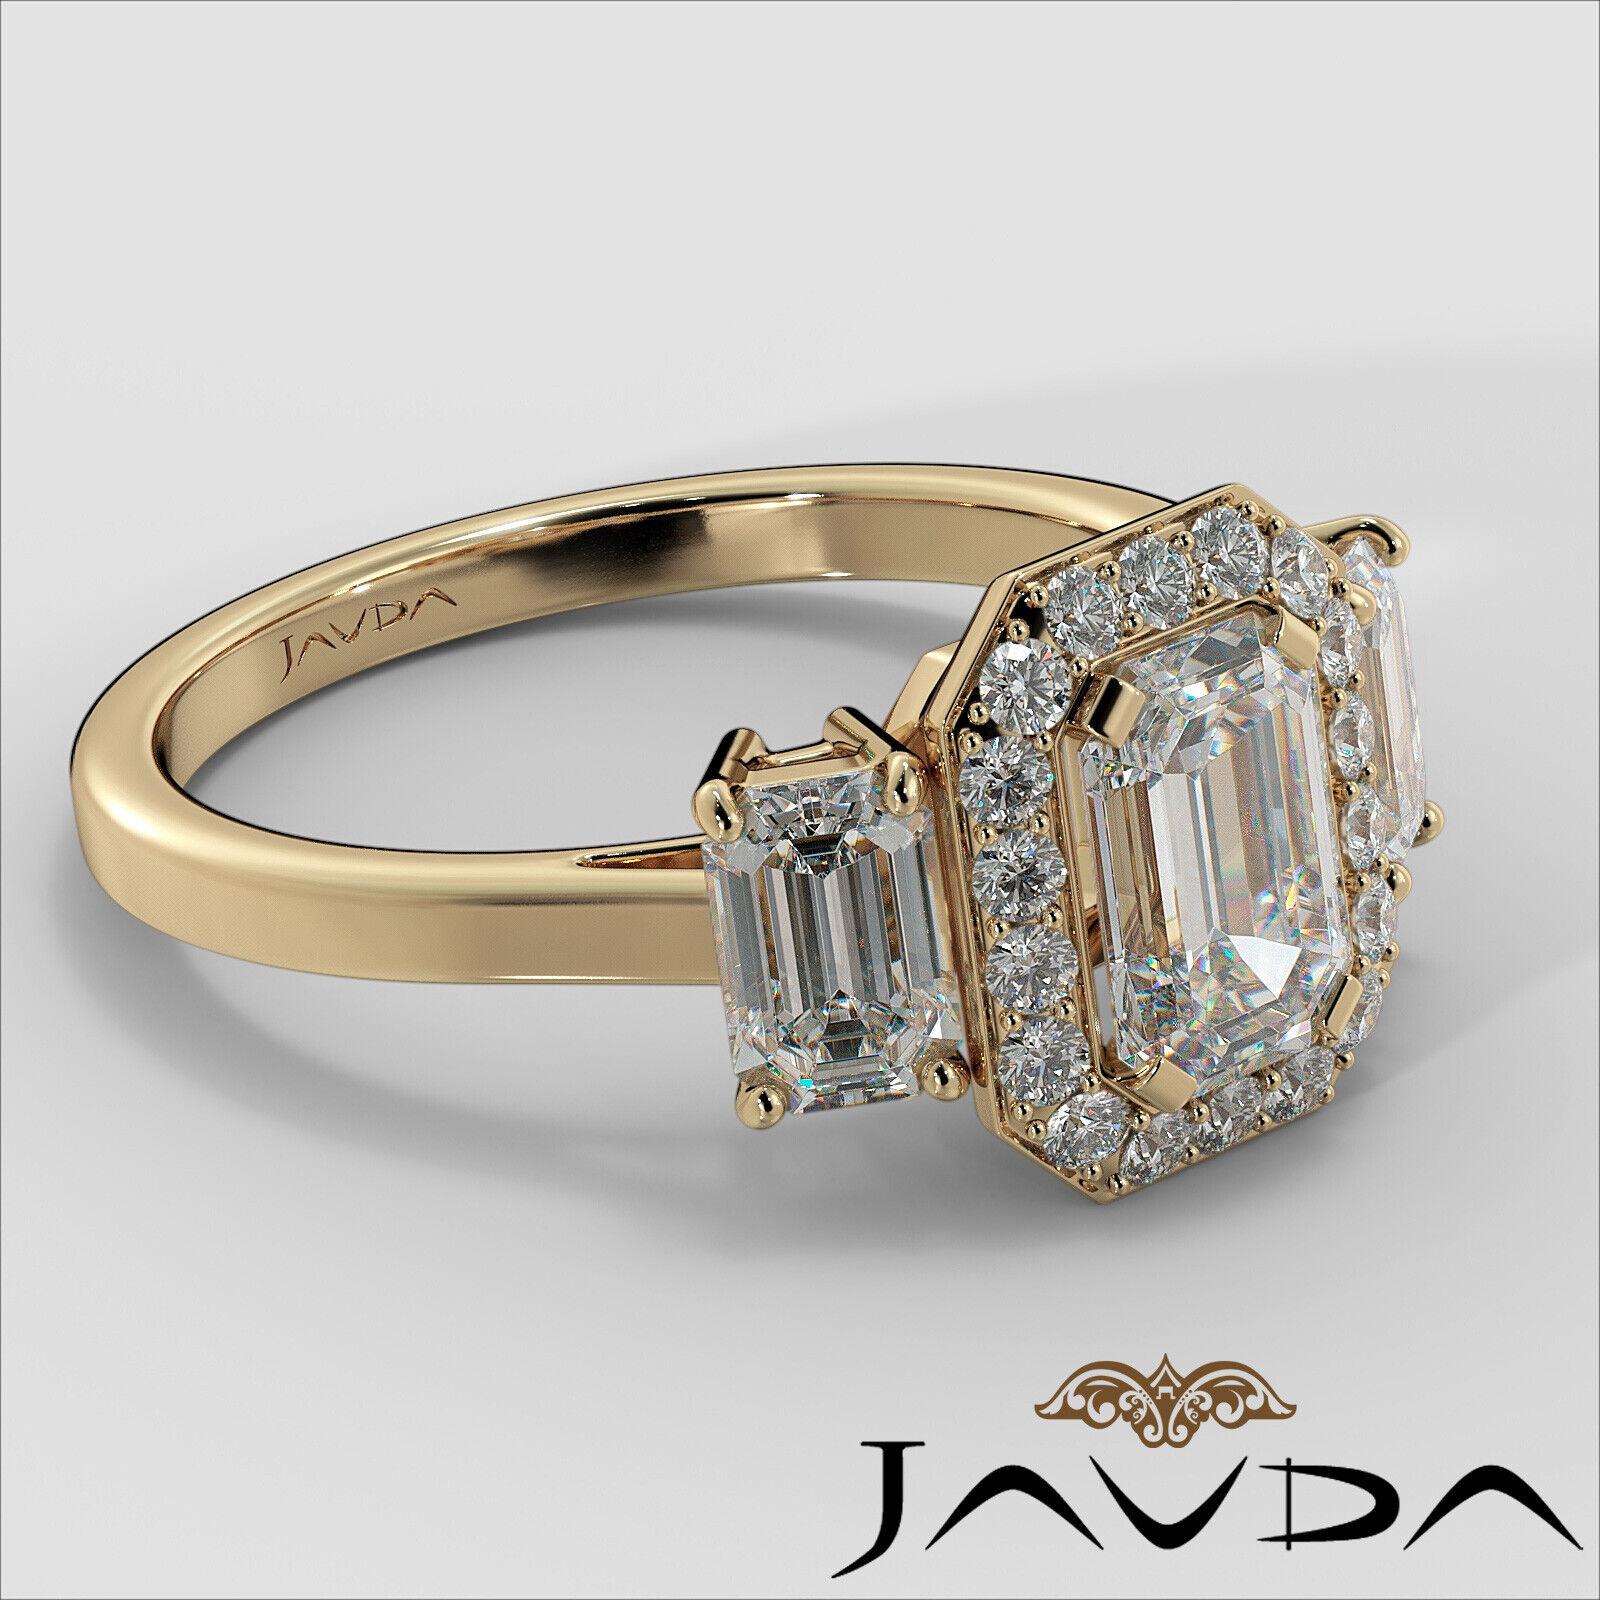 1.55ctw 3 Stone Halo Pave Emerald Diamond Engagement Ring GIA F-SI2 White Gold 10